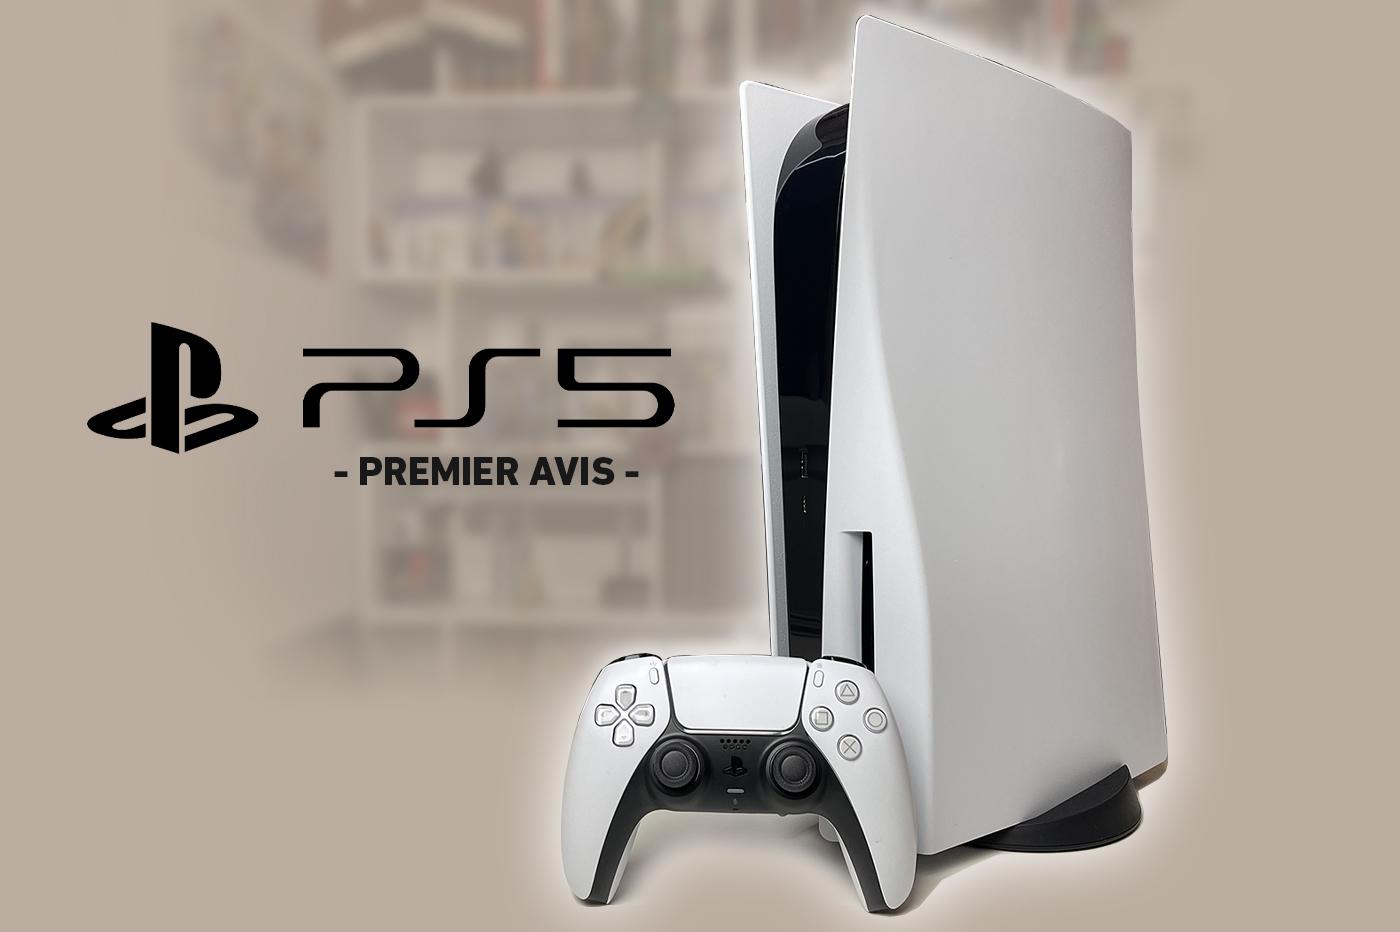 Premier Avis PS5 PlayStation 5